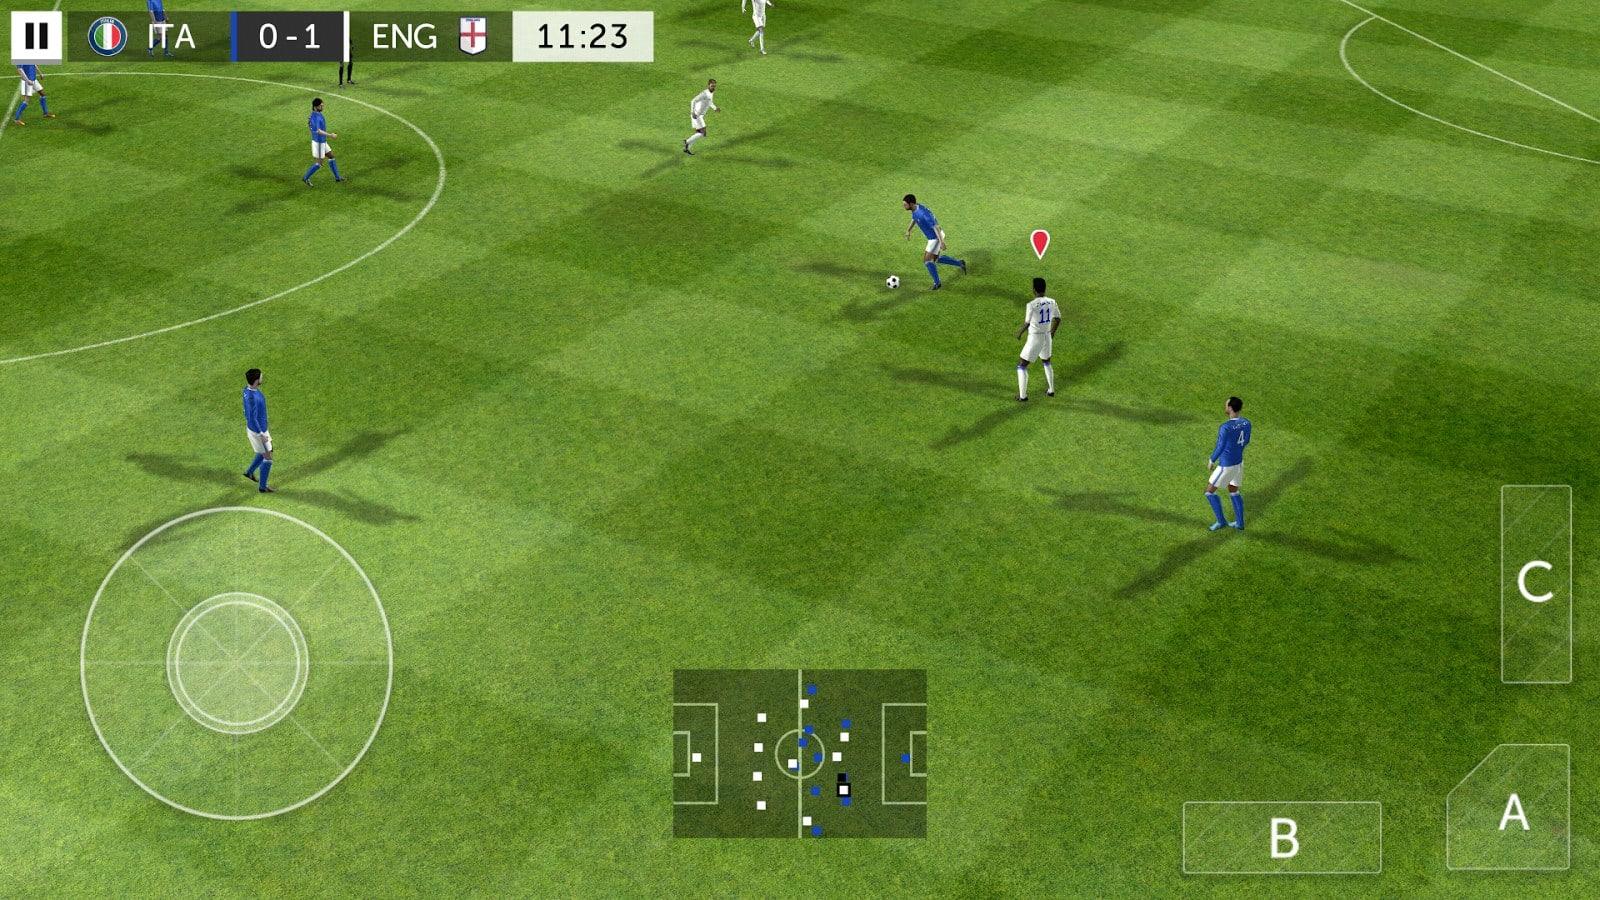 крючком настолько симулятор футбола на андроид день